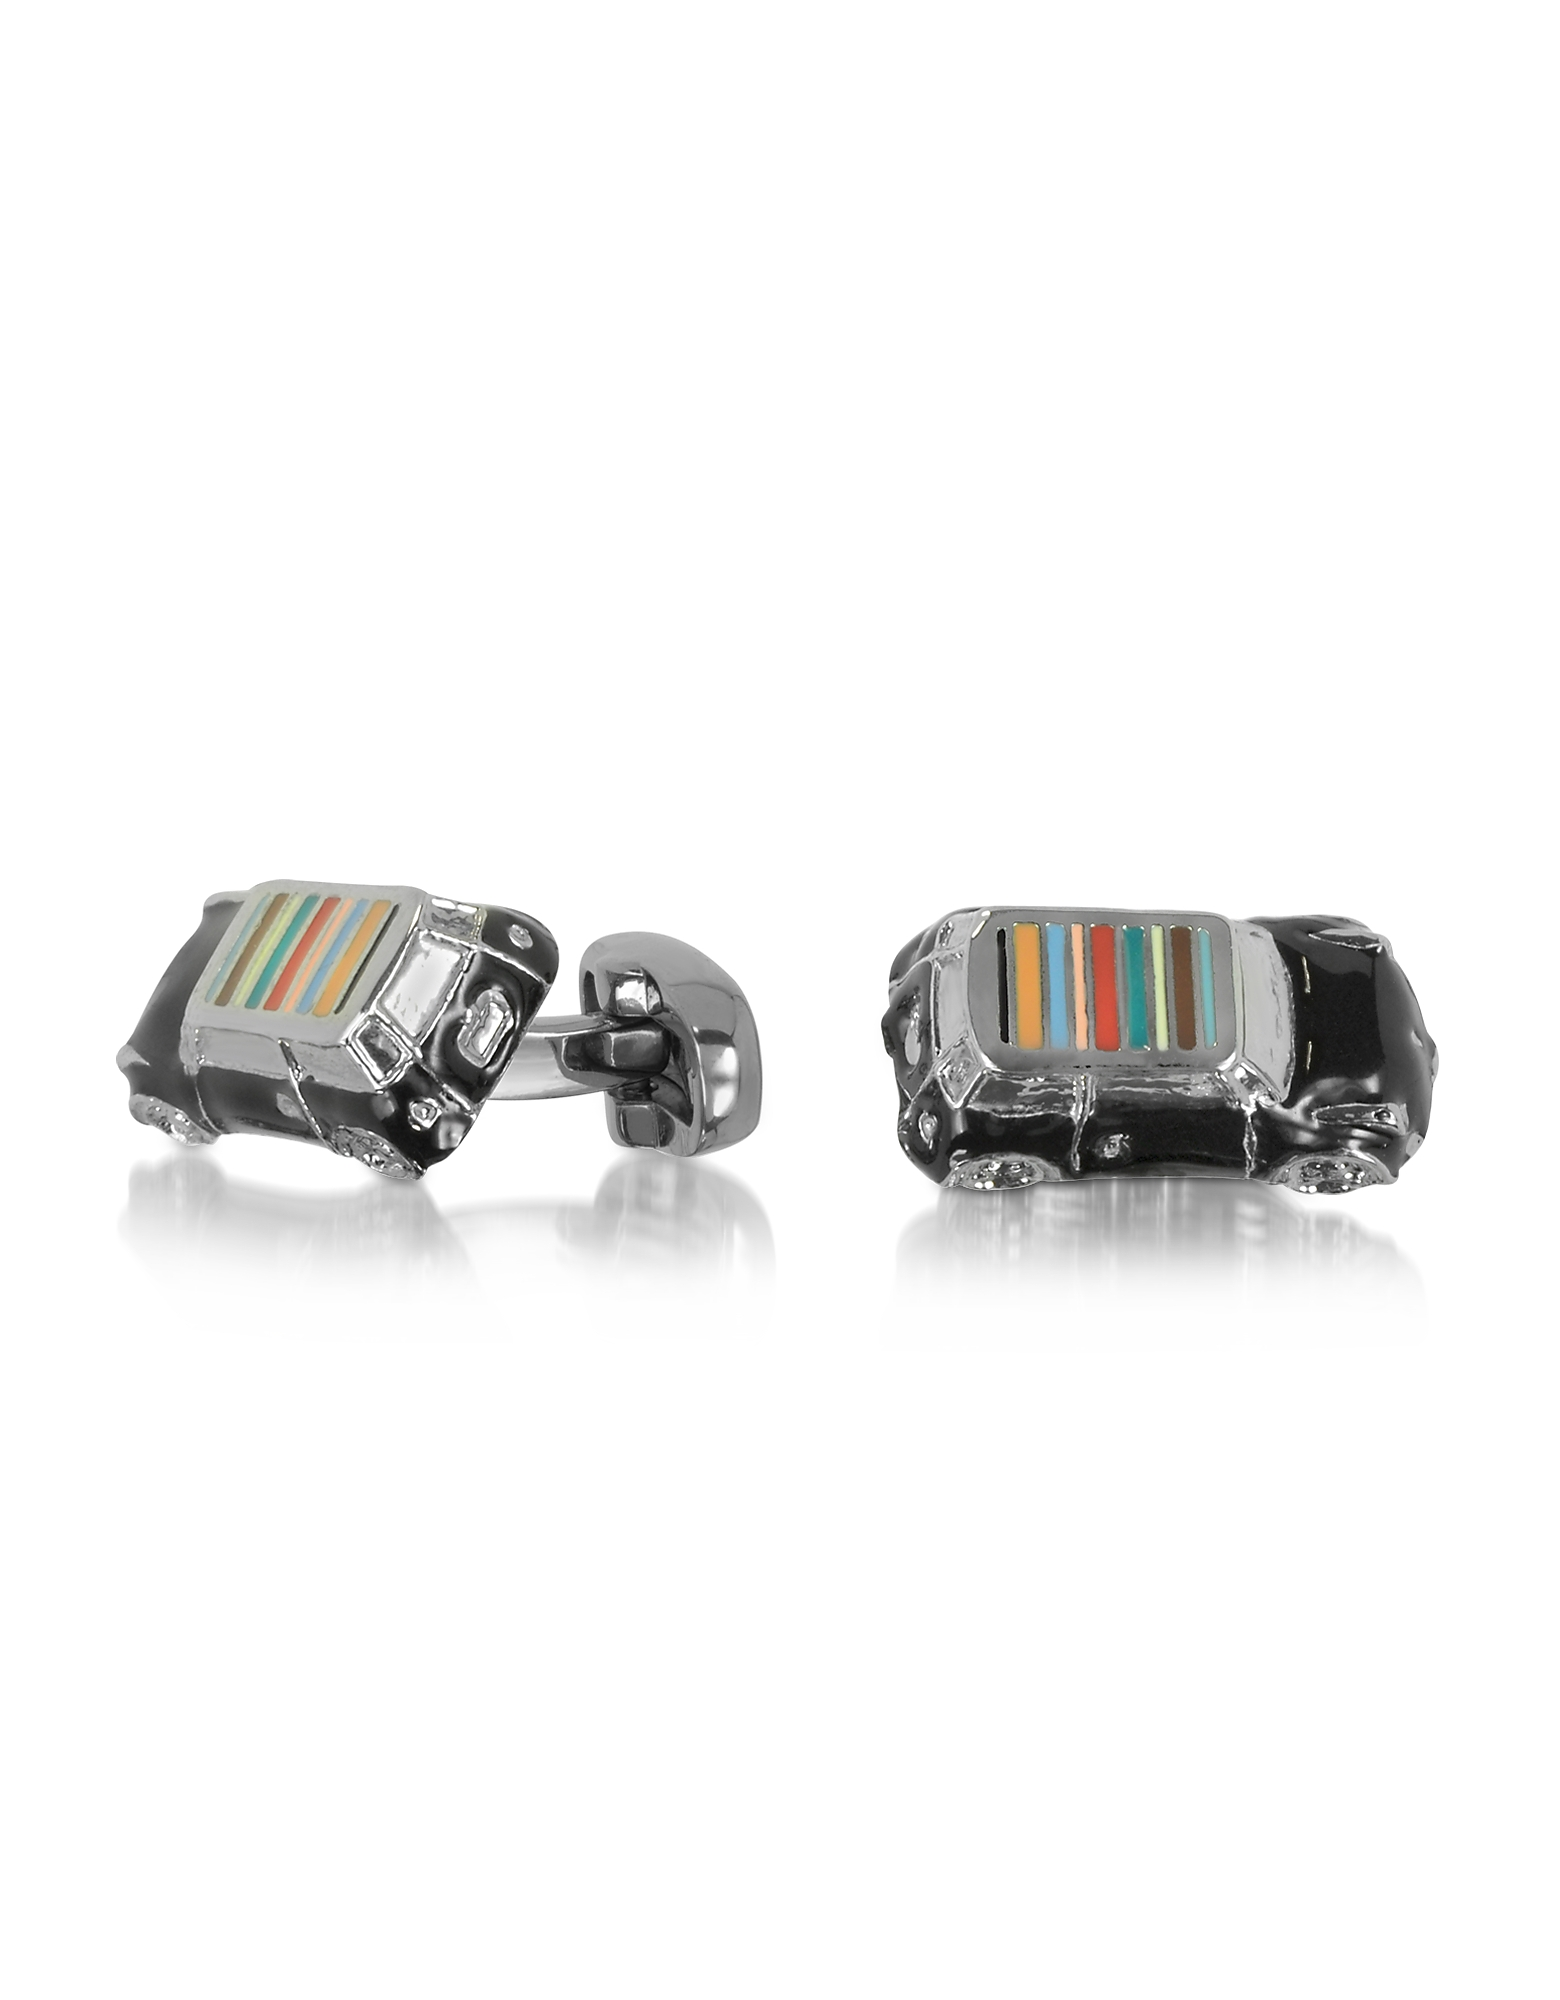 Фото Mini-Car - Мужские Запонки 3D в Форме Мини с Фирменными Полосками на Крыше. Купить с доставкой